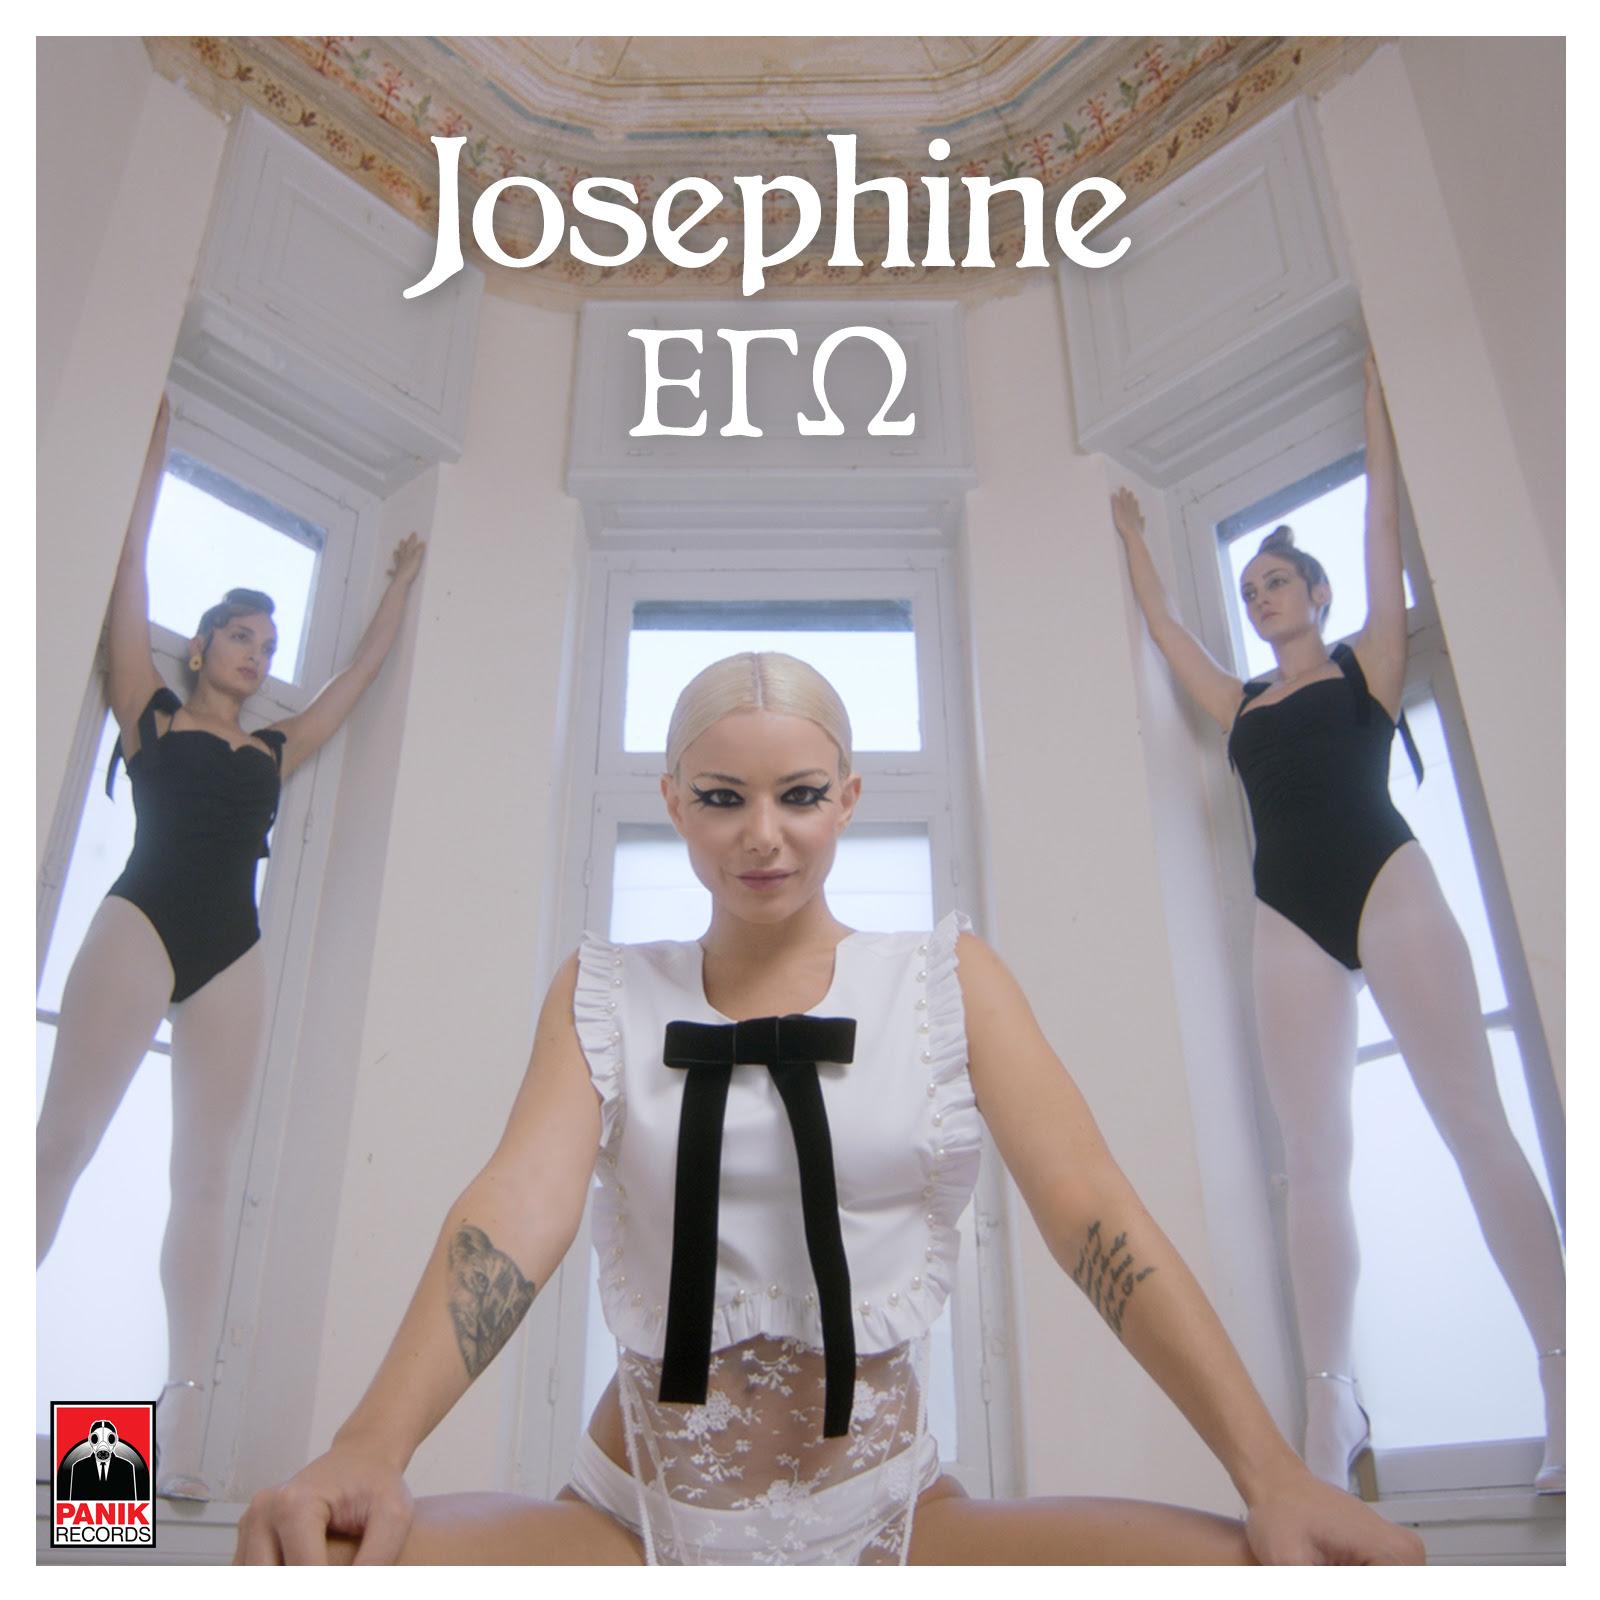 Josephine – «Εγώ»: Πάνω από 1 εκατομμύριο YouTube views σε λίγες μόνο ημέρες!